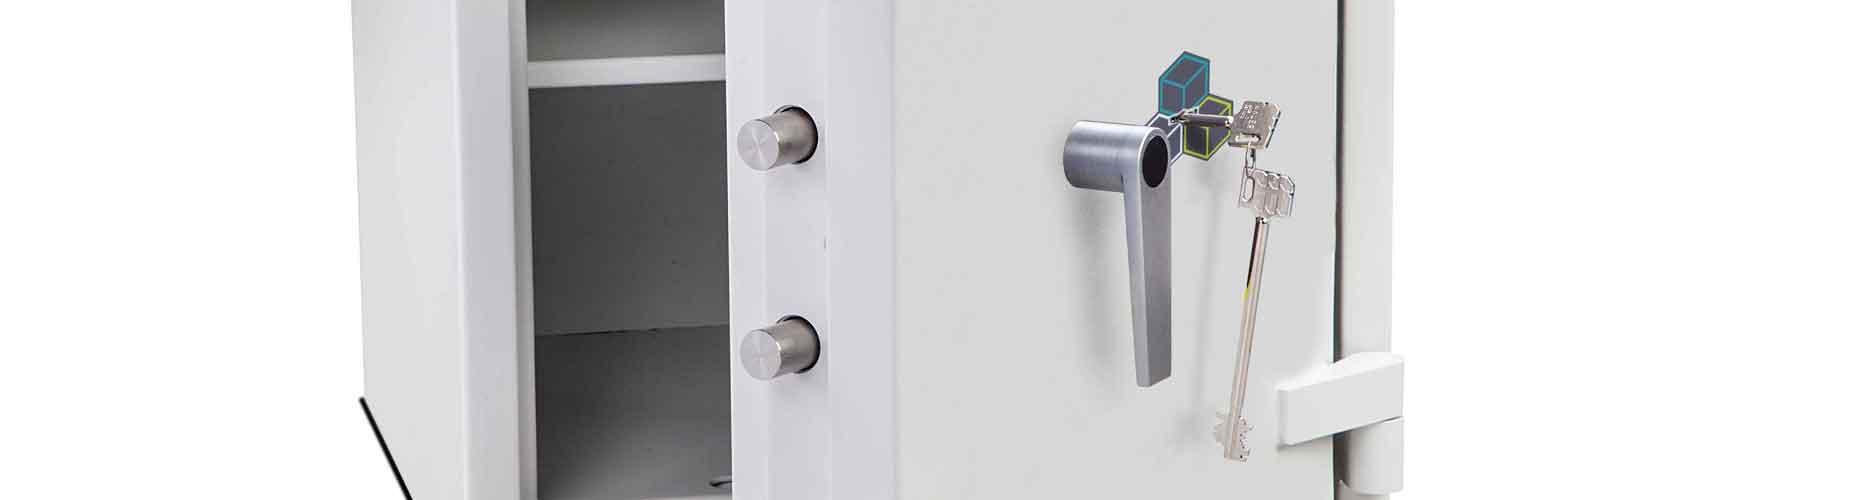 Key Locking Home Safes